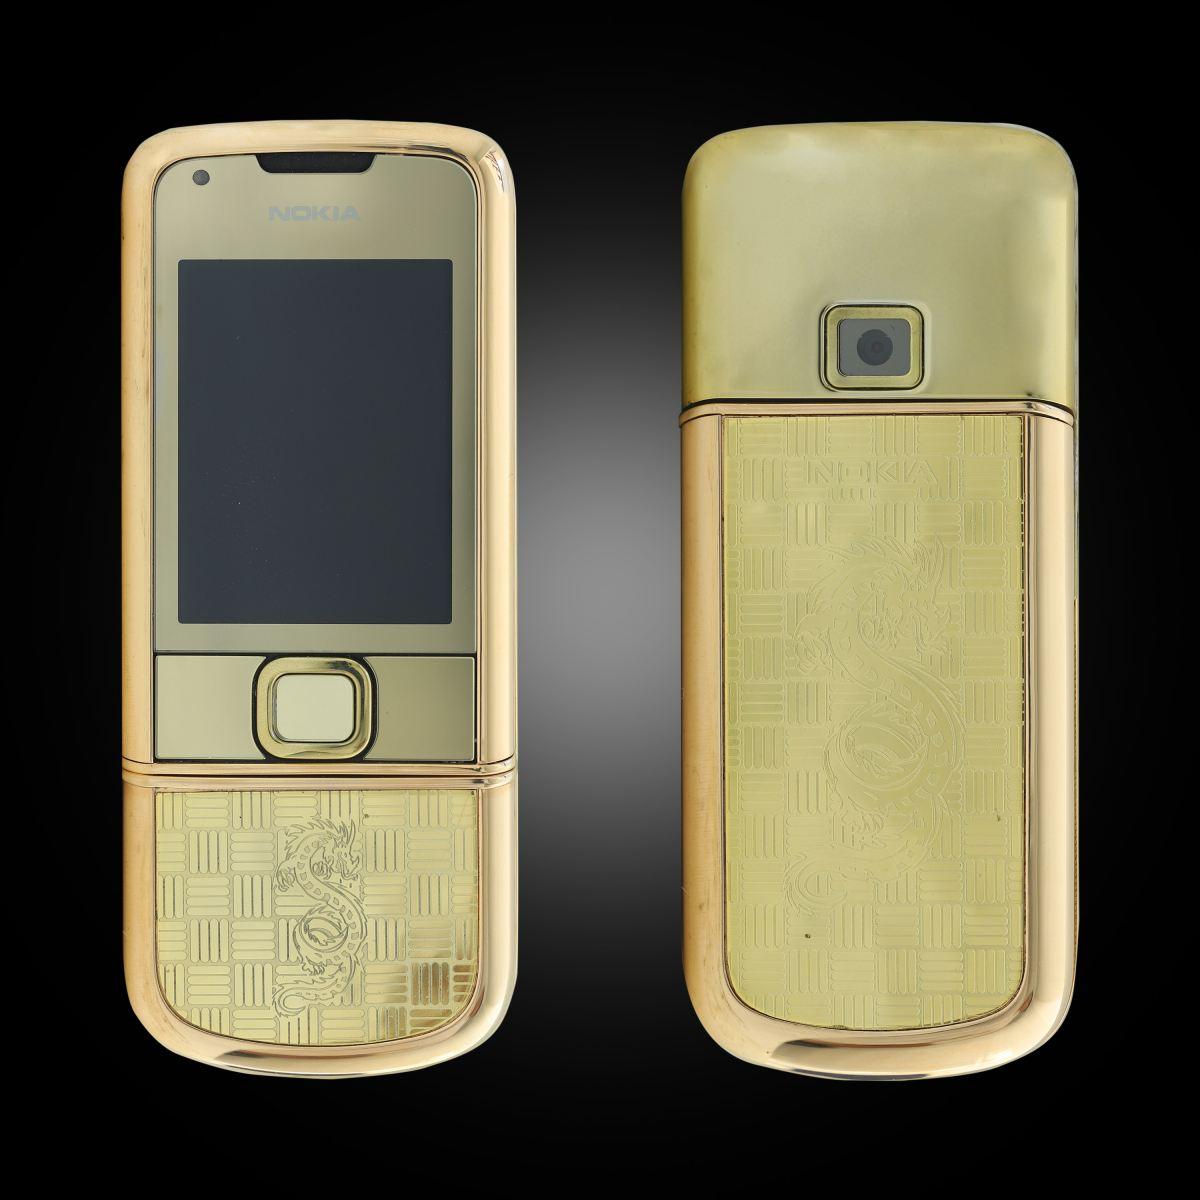 Nokia 8800 Rose Gold khảm rồng 1